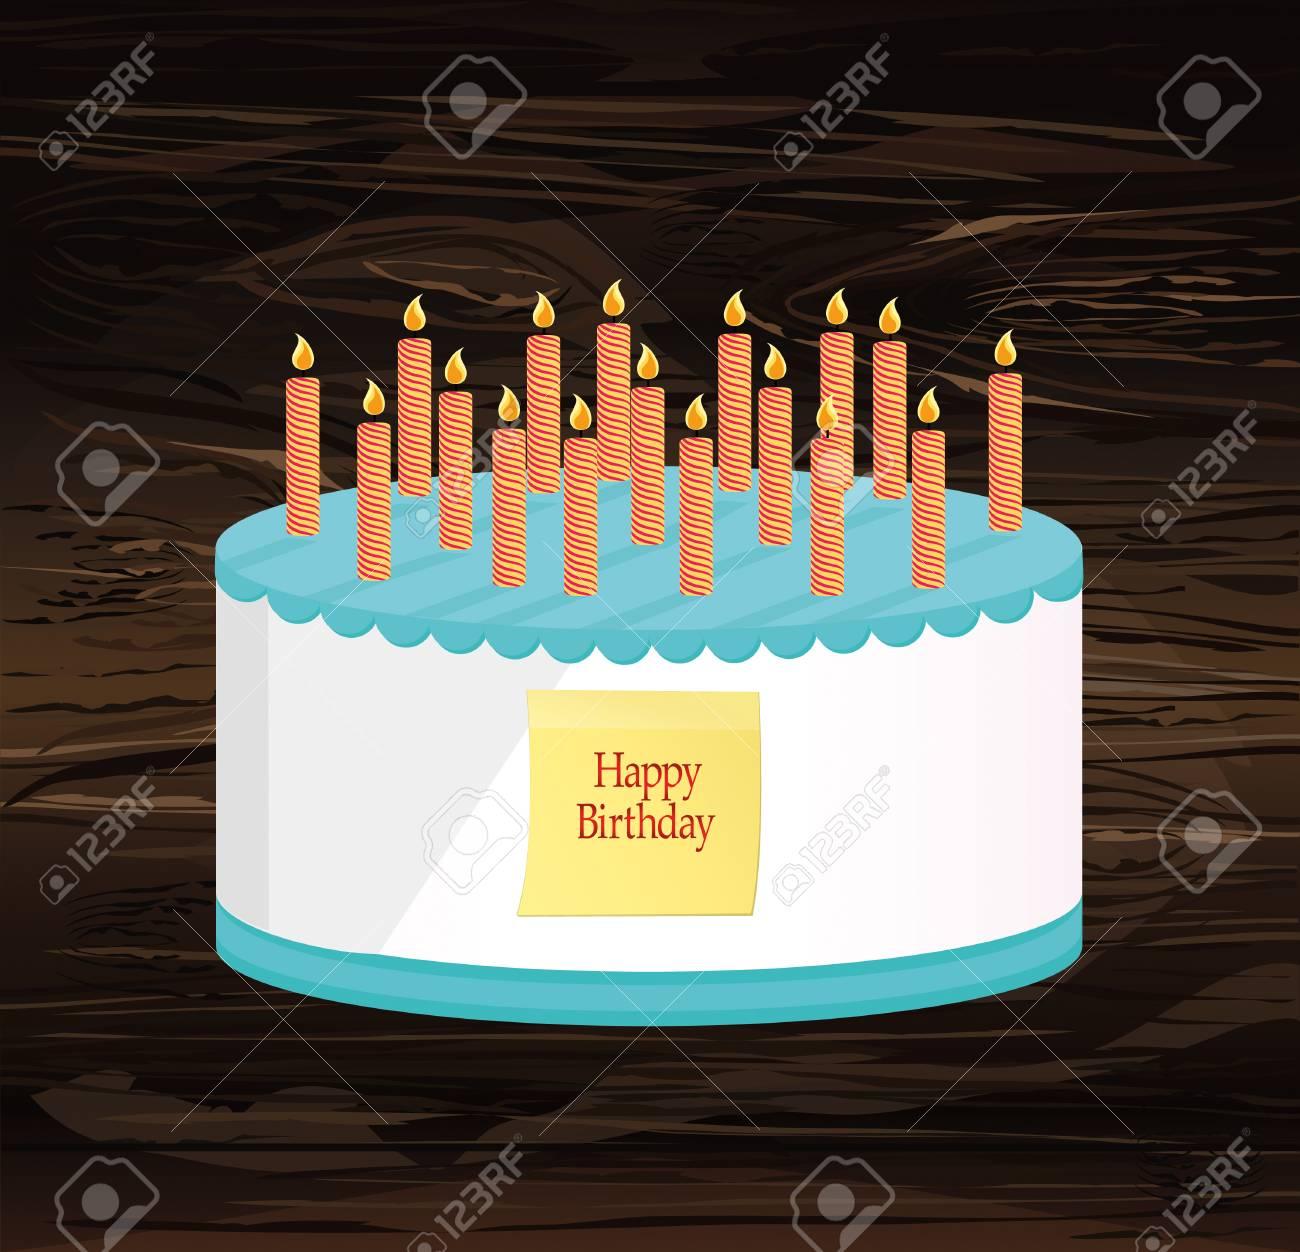 Festive Big Cake Happy Birthday Greeting Card Or Invitation For A Holiday Empty